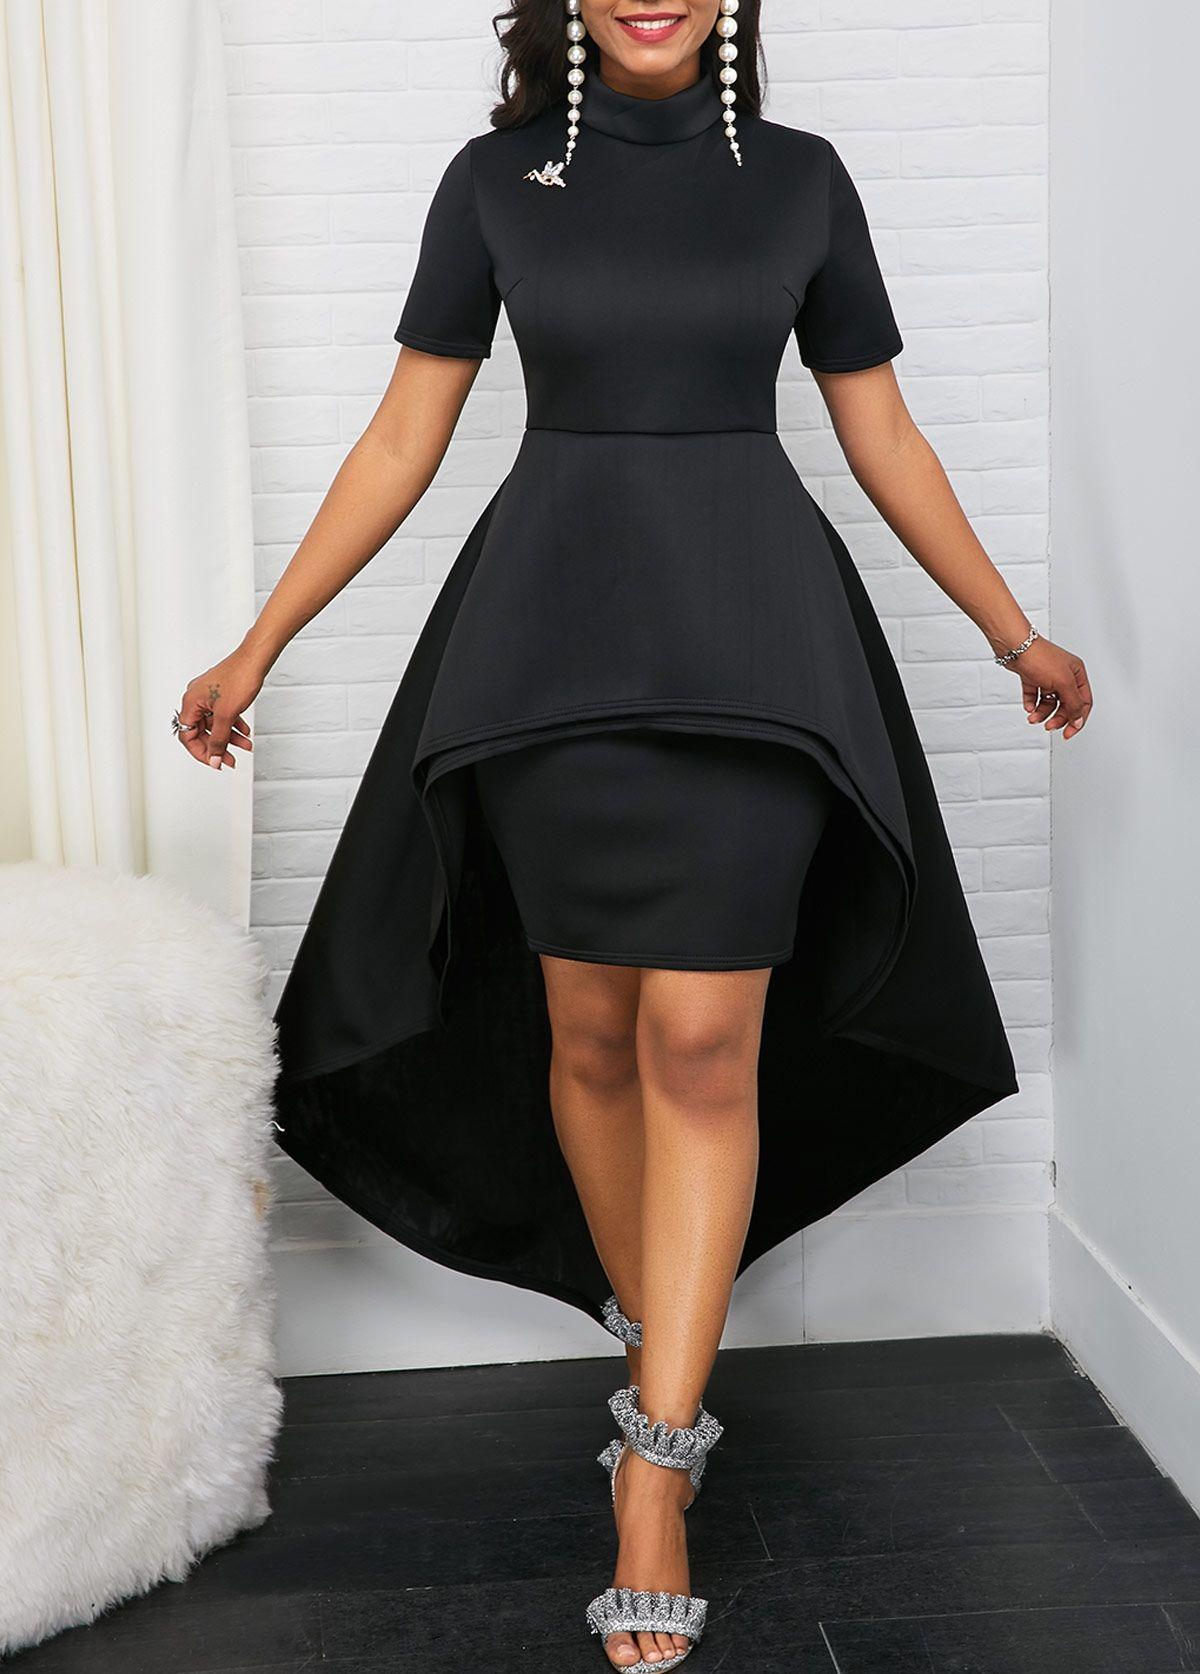 Mock Neck Short Sleeve Black High Low Dress Rotita Com Usd 37 57 Black High Low Dress Shop Casual Dresses High Low Dress [ 1674 x 1200 Pixel ]